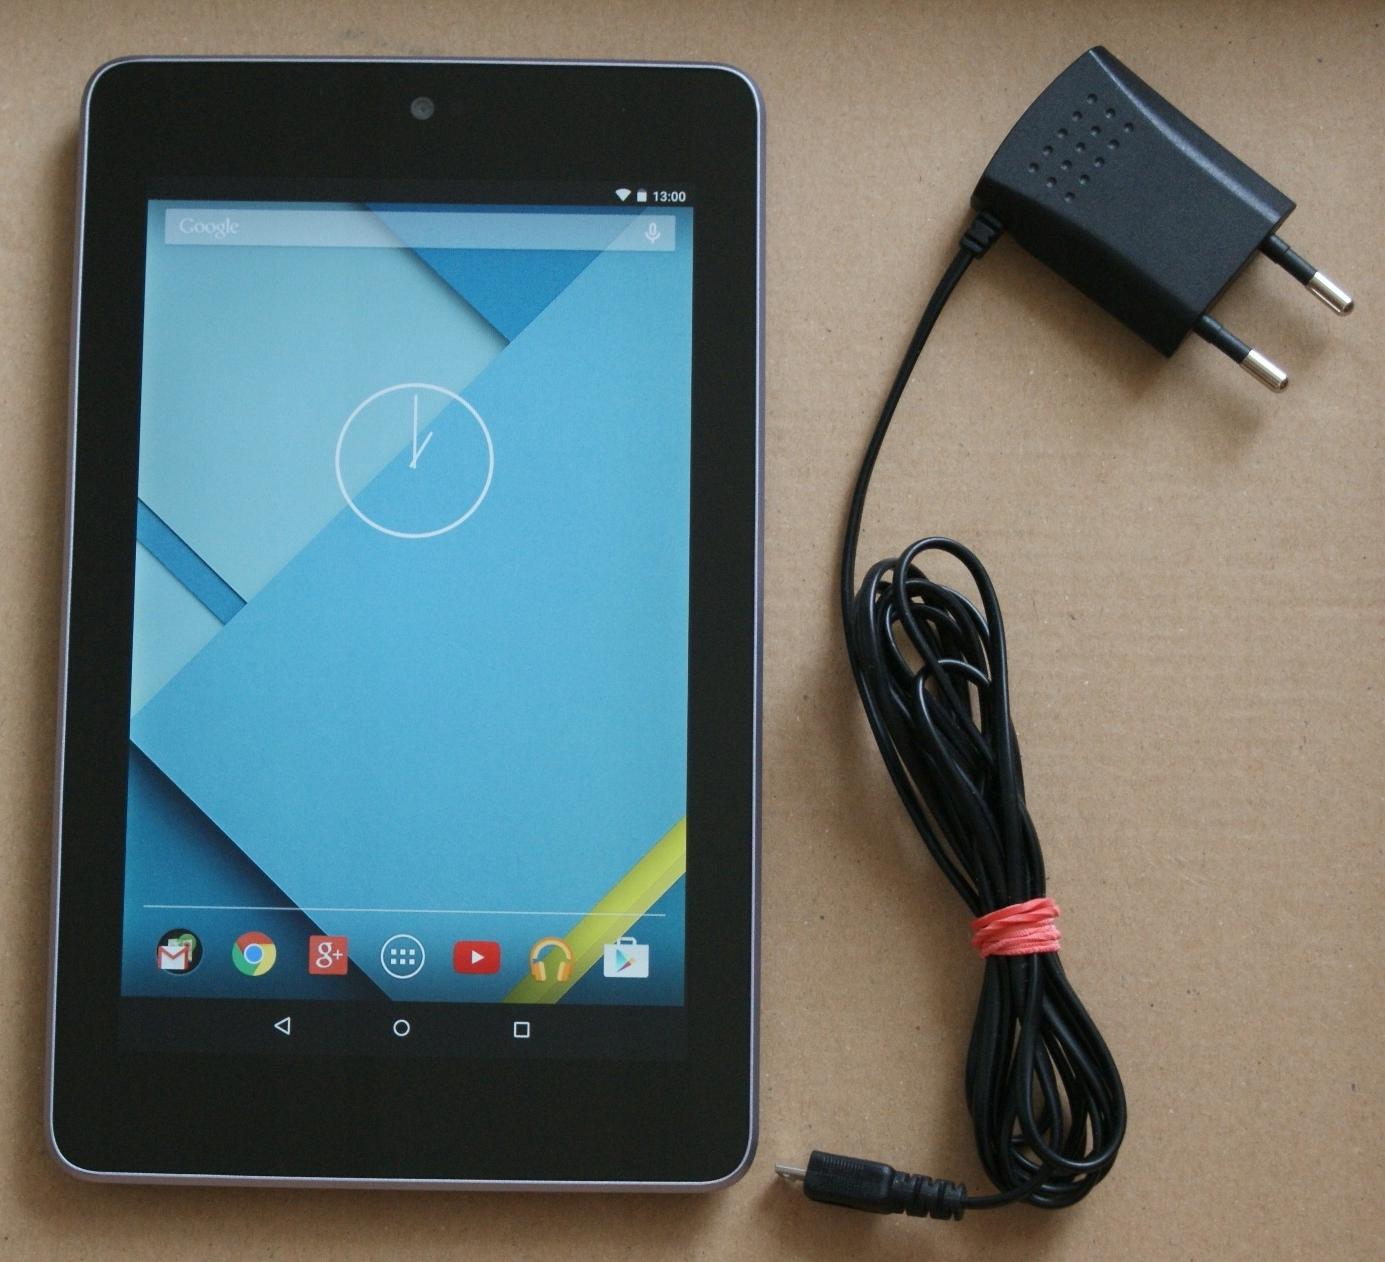 Tablet Asus Google Nexus 7 32GB 1GB Android 5 1 1